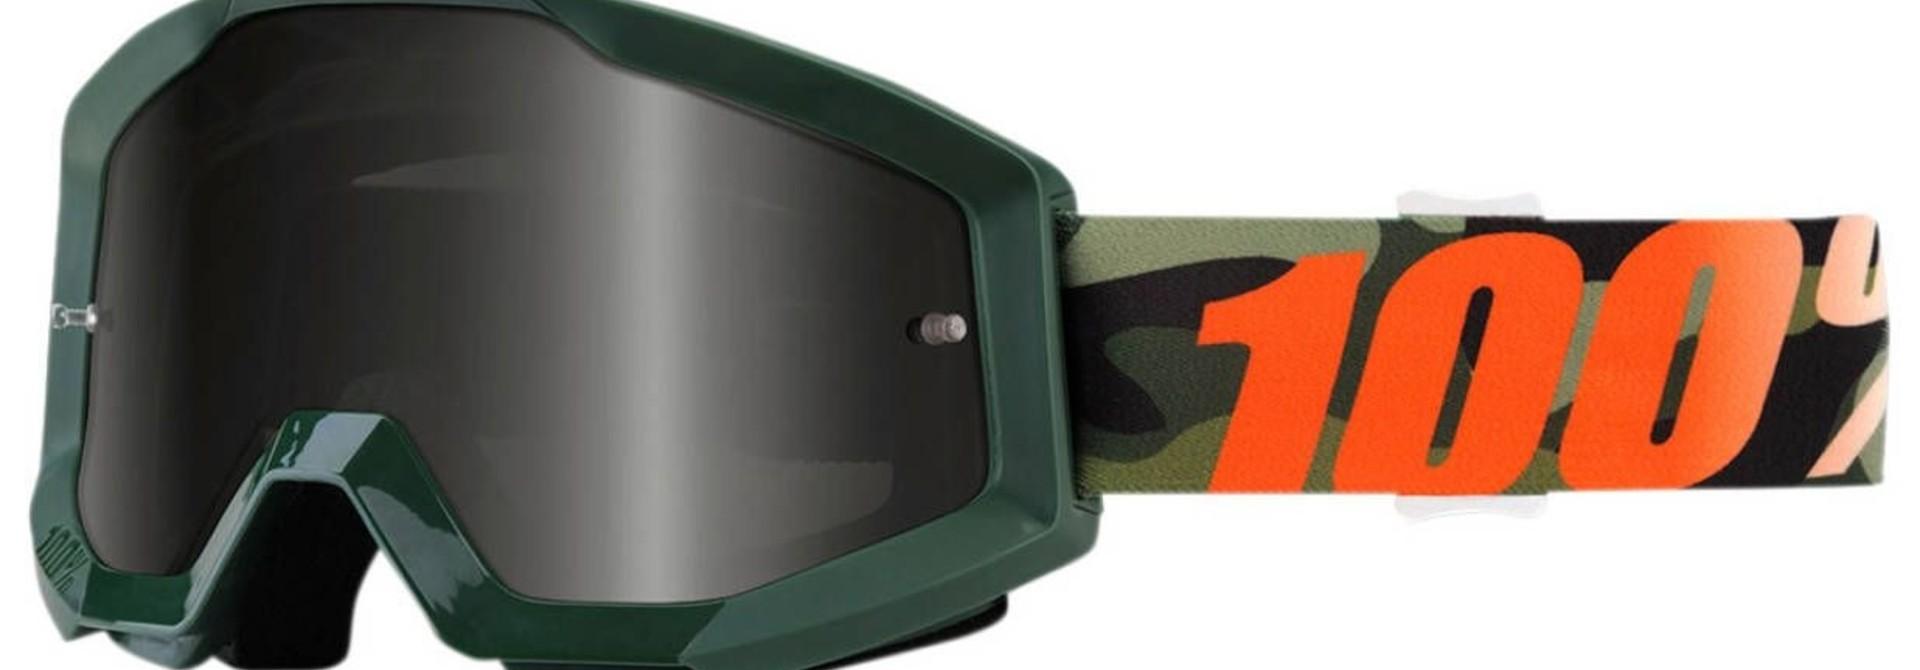 100% Strata Goggles / Mirror Lens